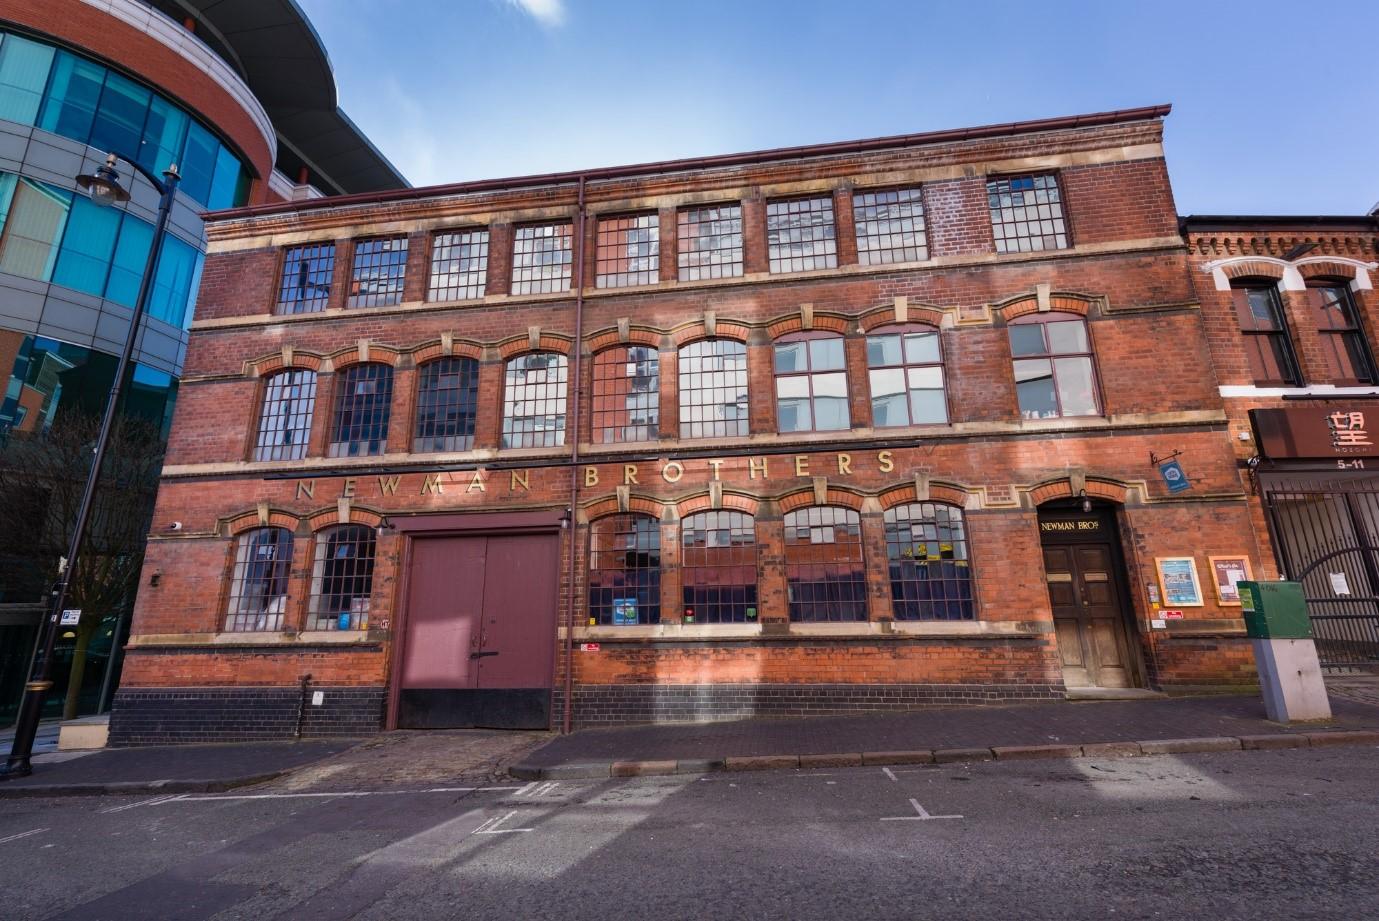 The Coffin Works Museum. 13-15 Fleet Street, Birmingham, B3 1JP